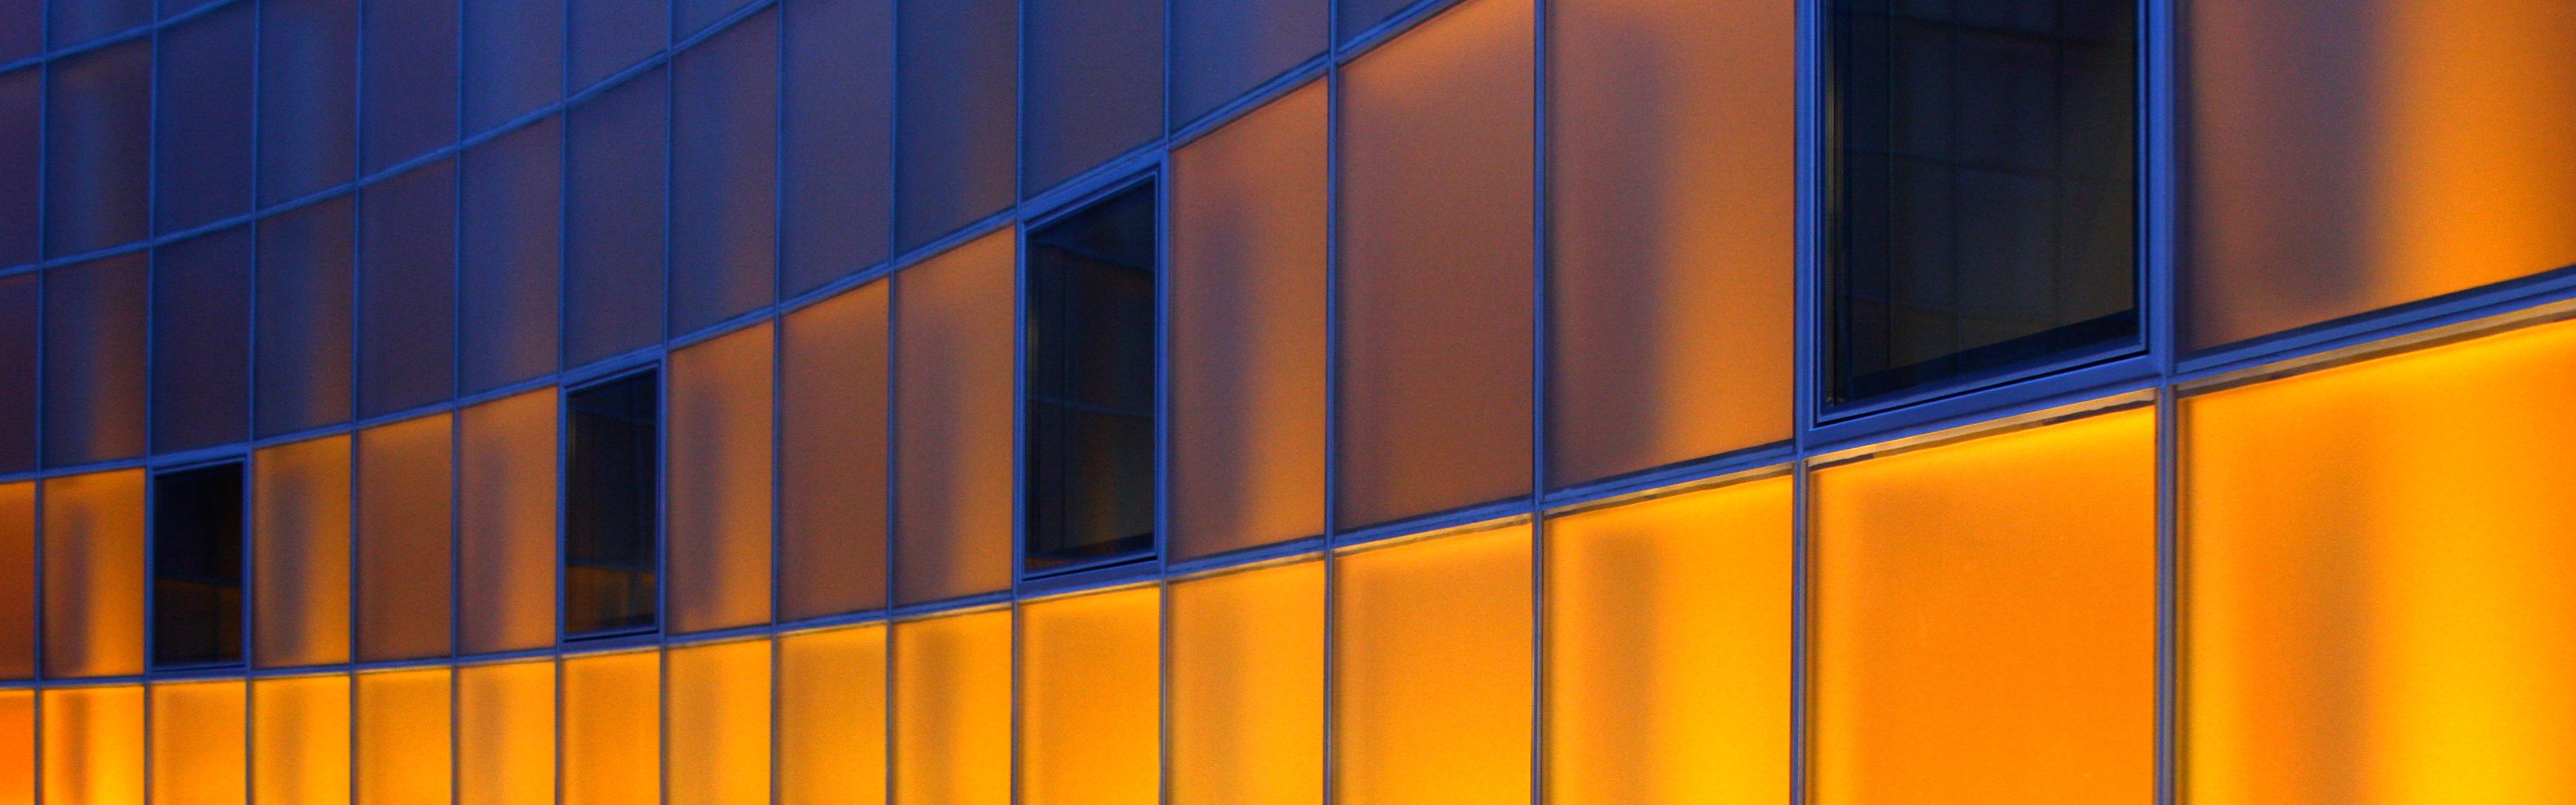 how to set panoramic wallpaper windows 10